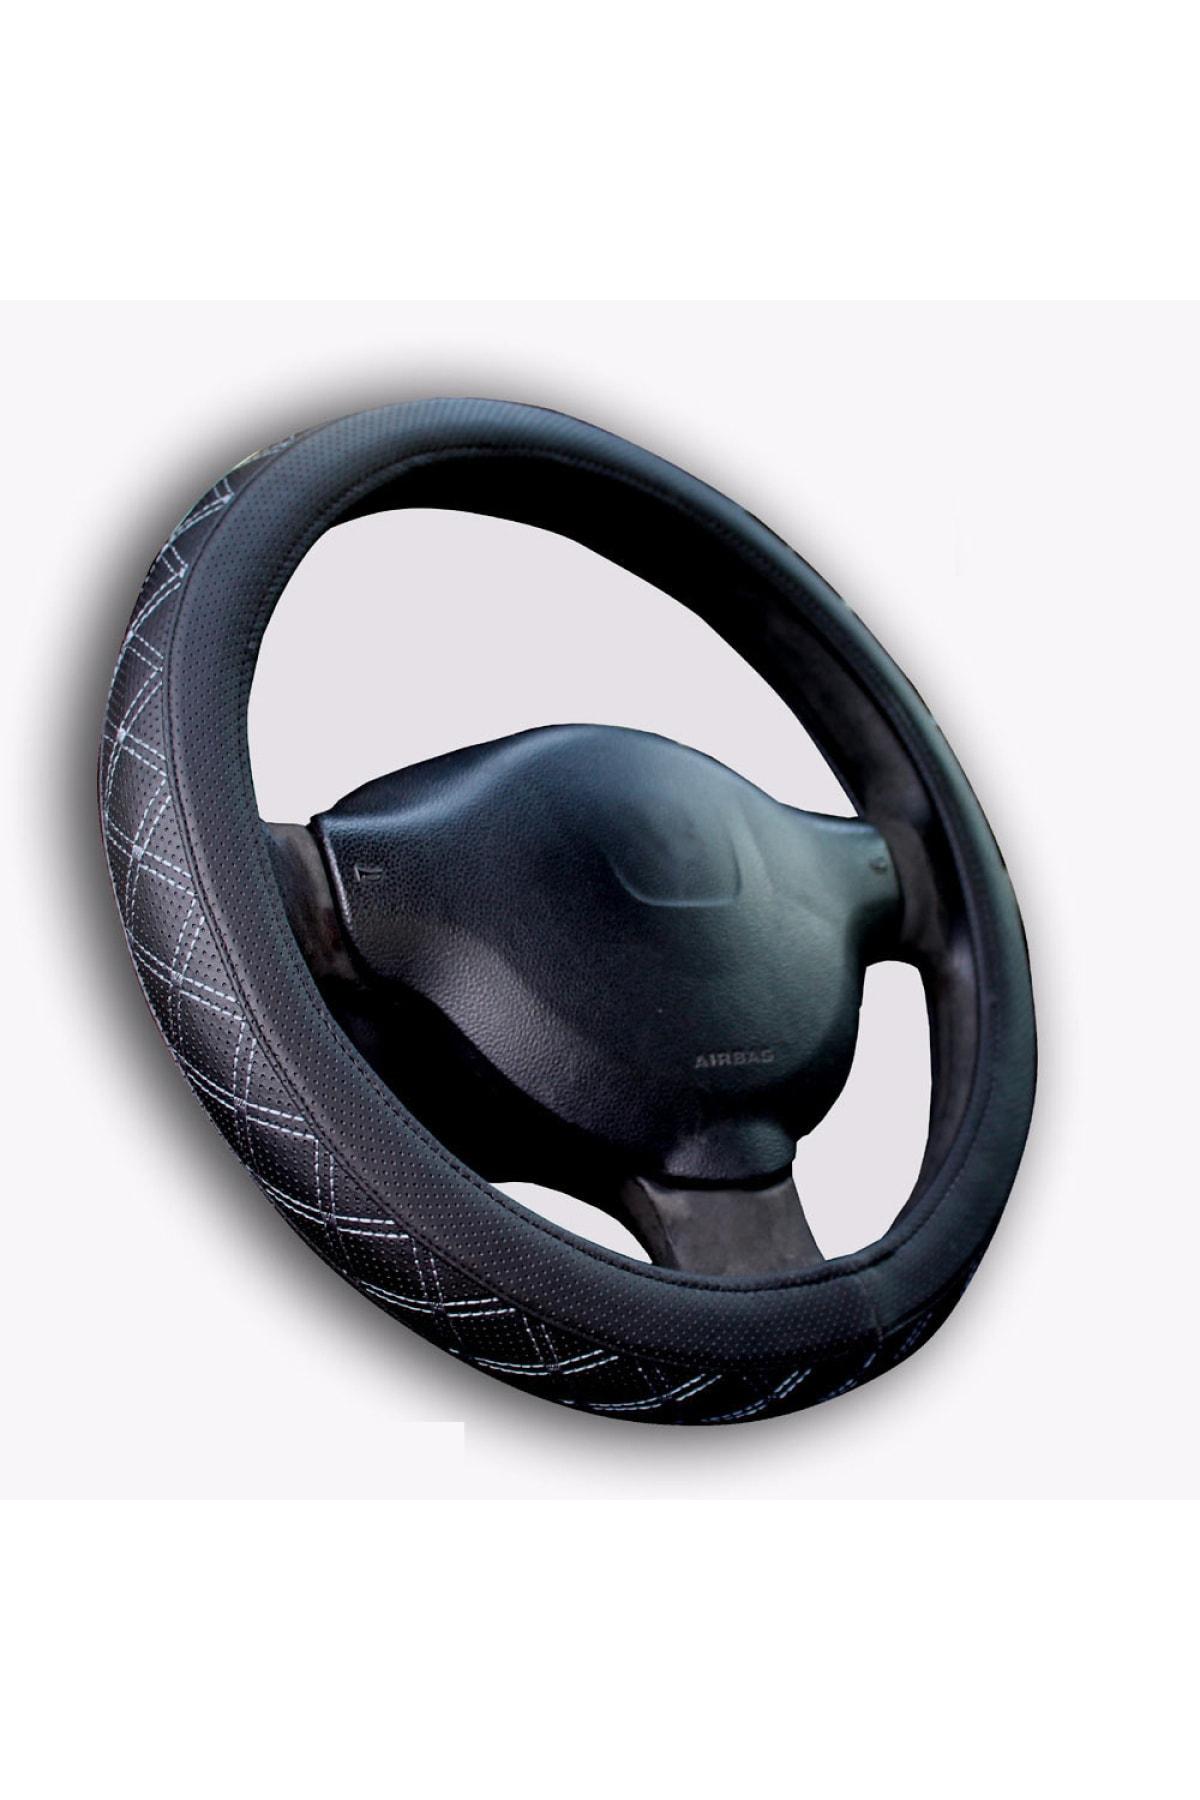 GARDENAUTO Renault Megane 2002-2009 A Kalite Geçmeli Direksiyon Kılıfı Gri Nakışlı 1